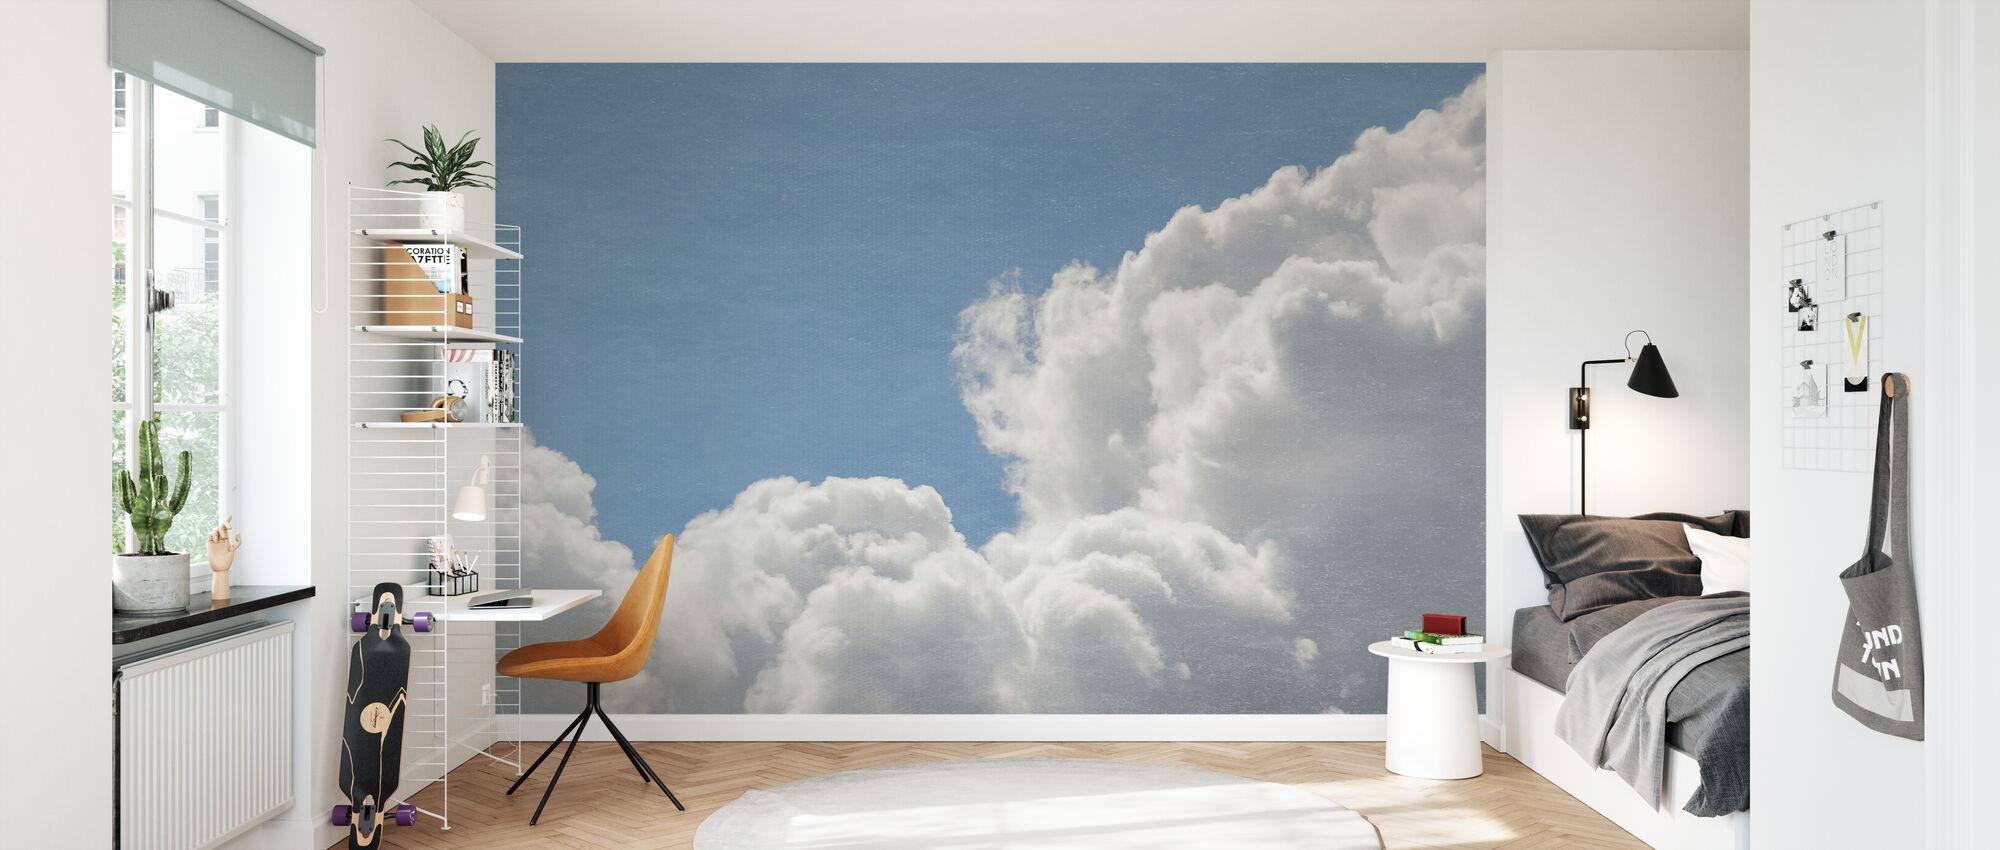 Blush Clouds Filter - Wallpaper - Kids Room